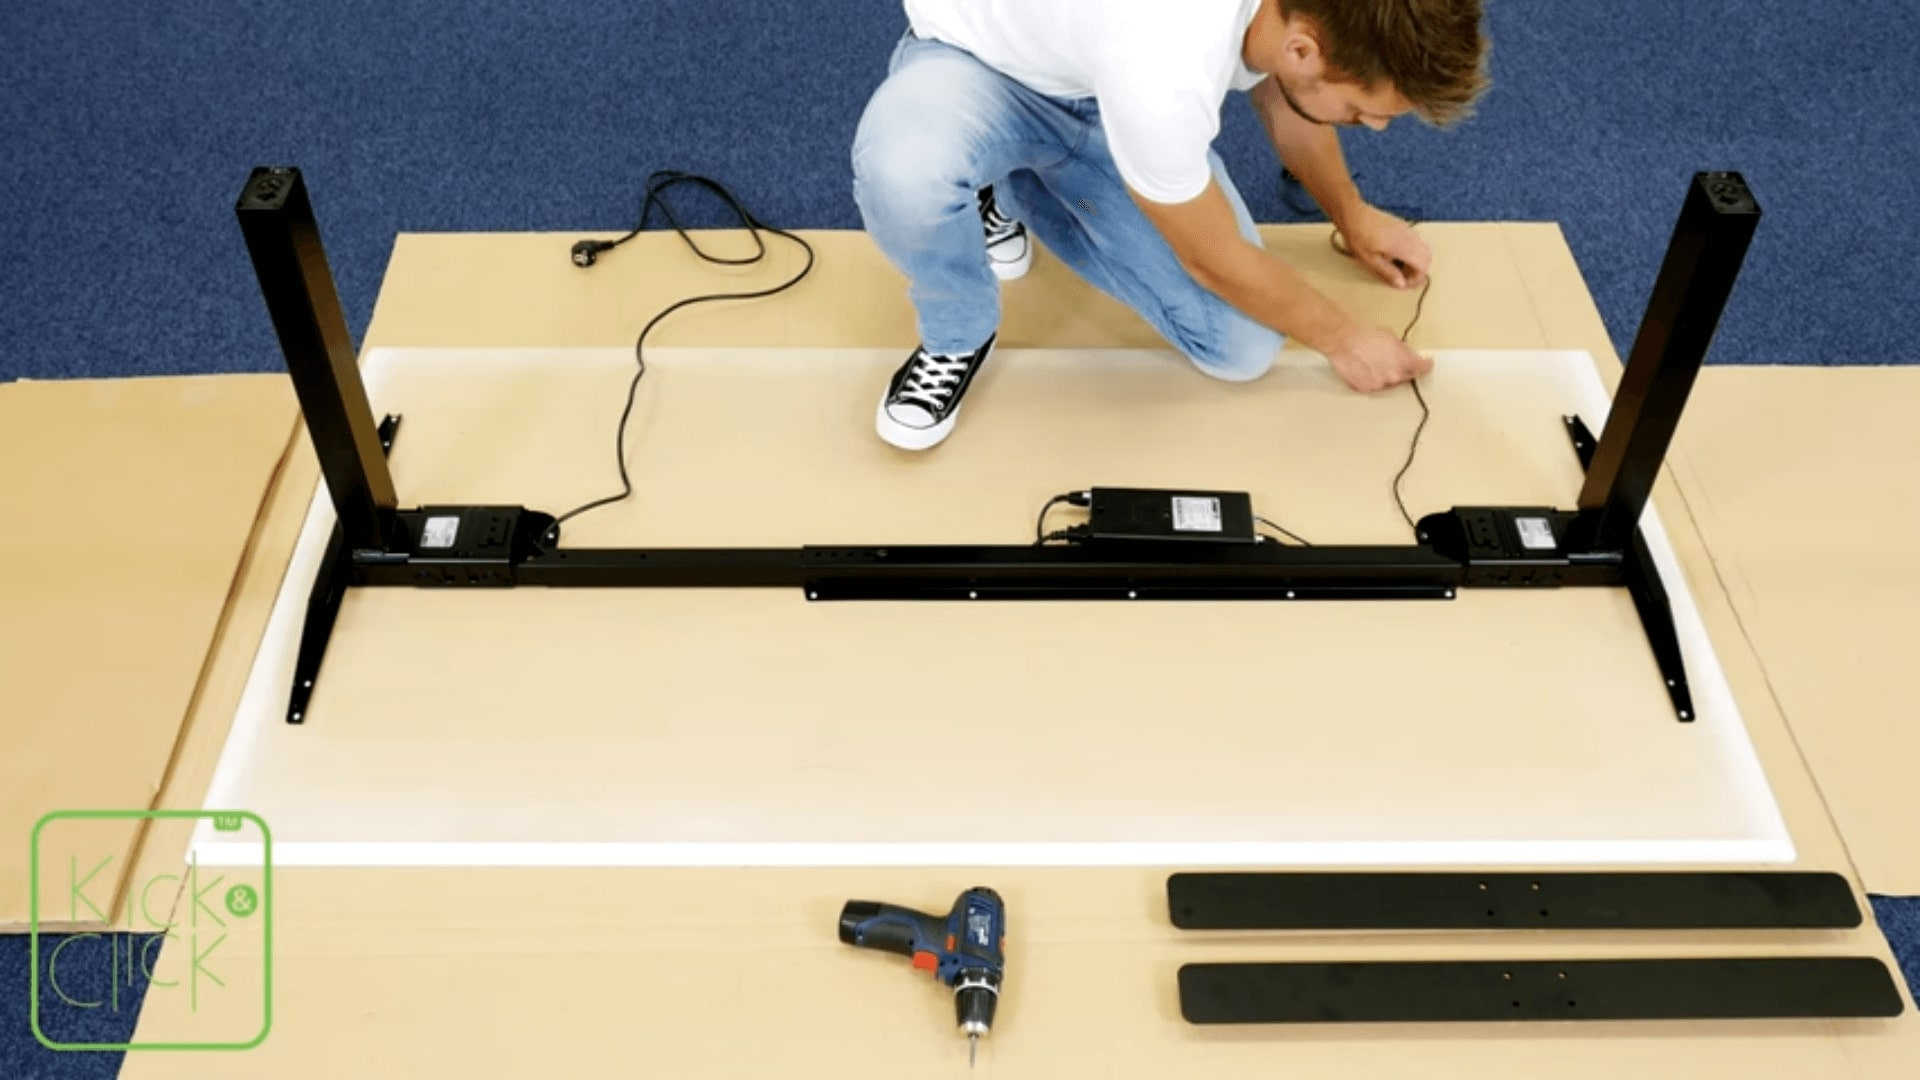 LINAK Kick & Click - How to easily assemble an office desk